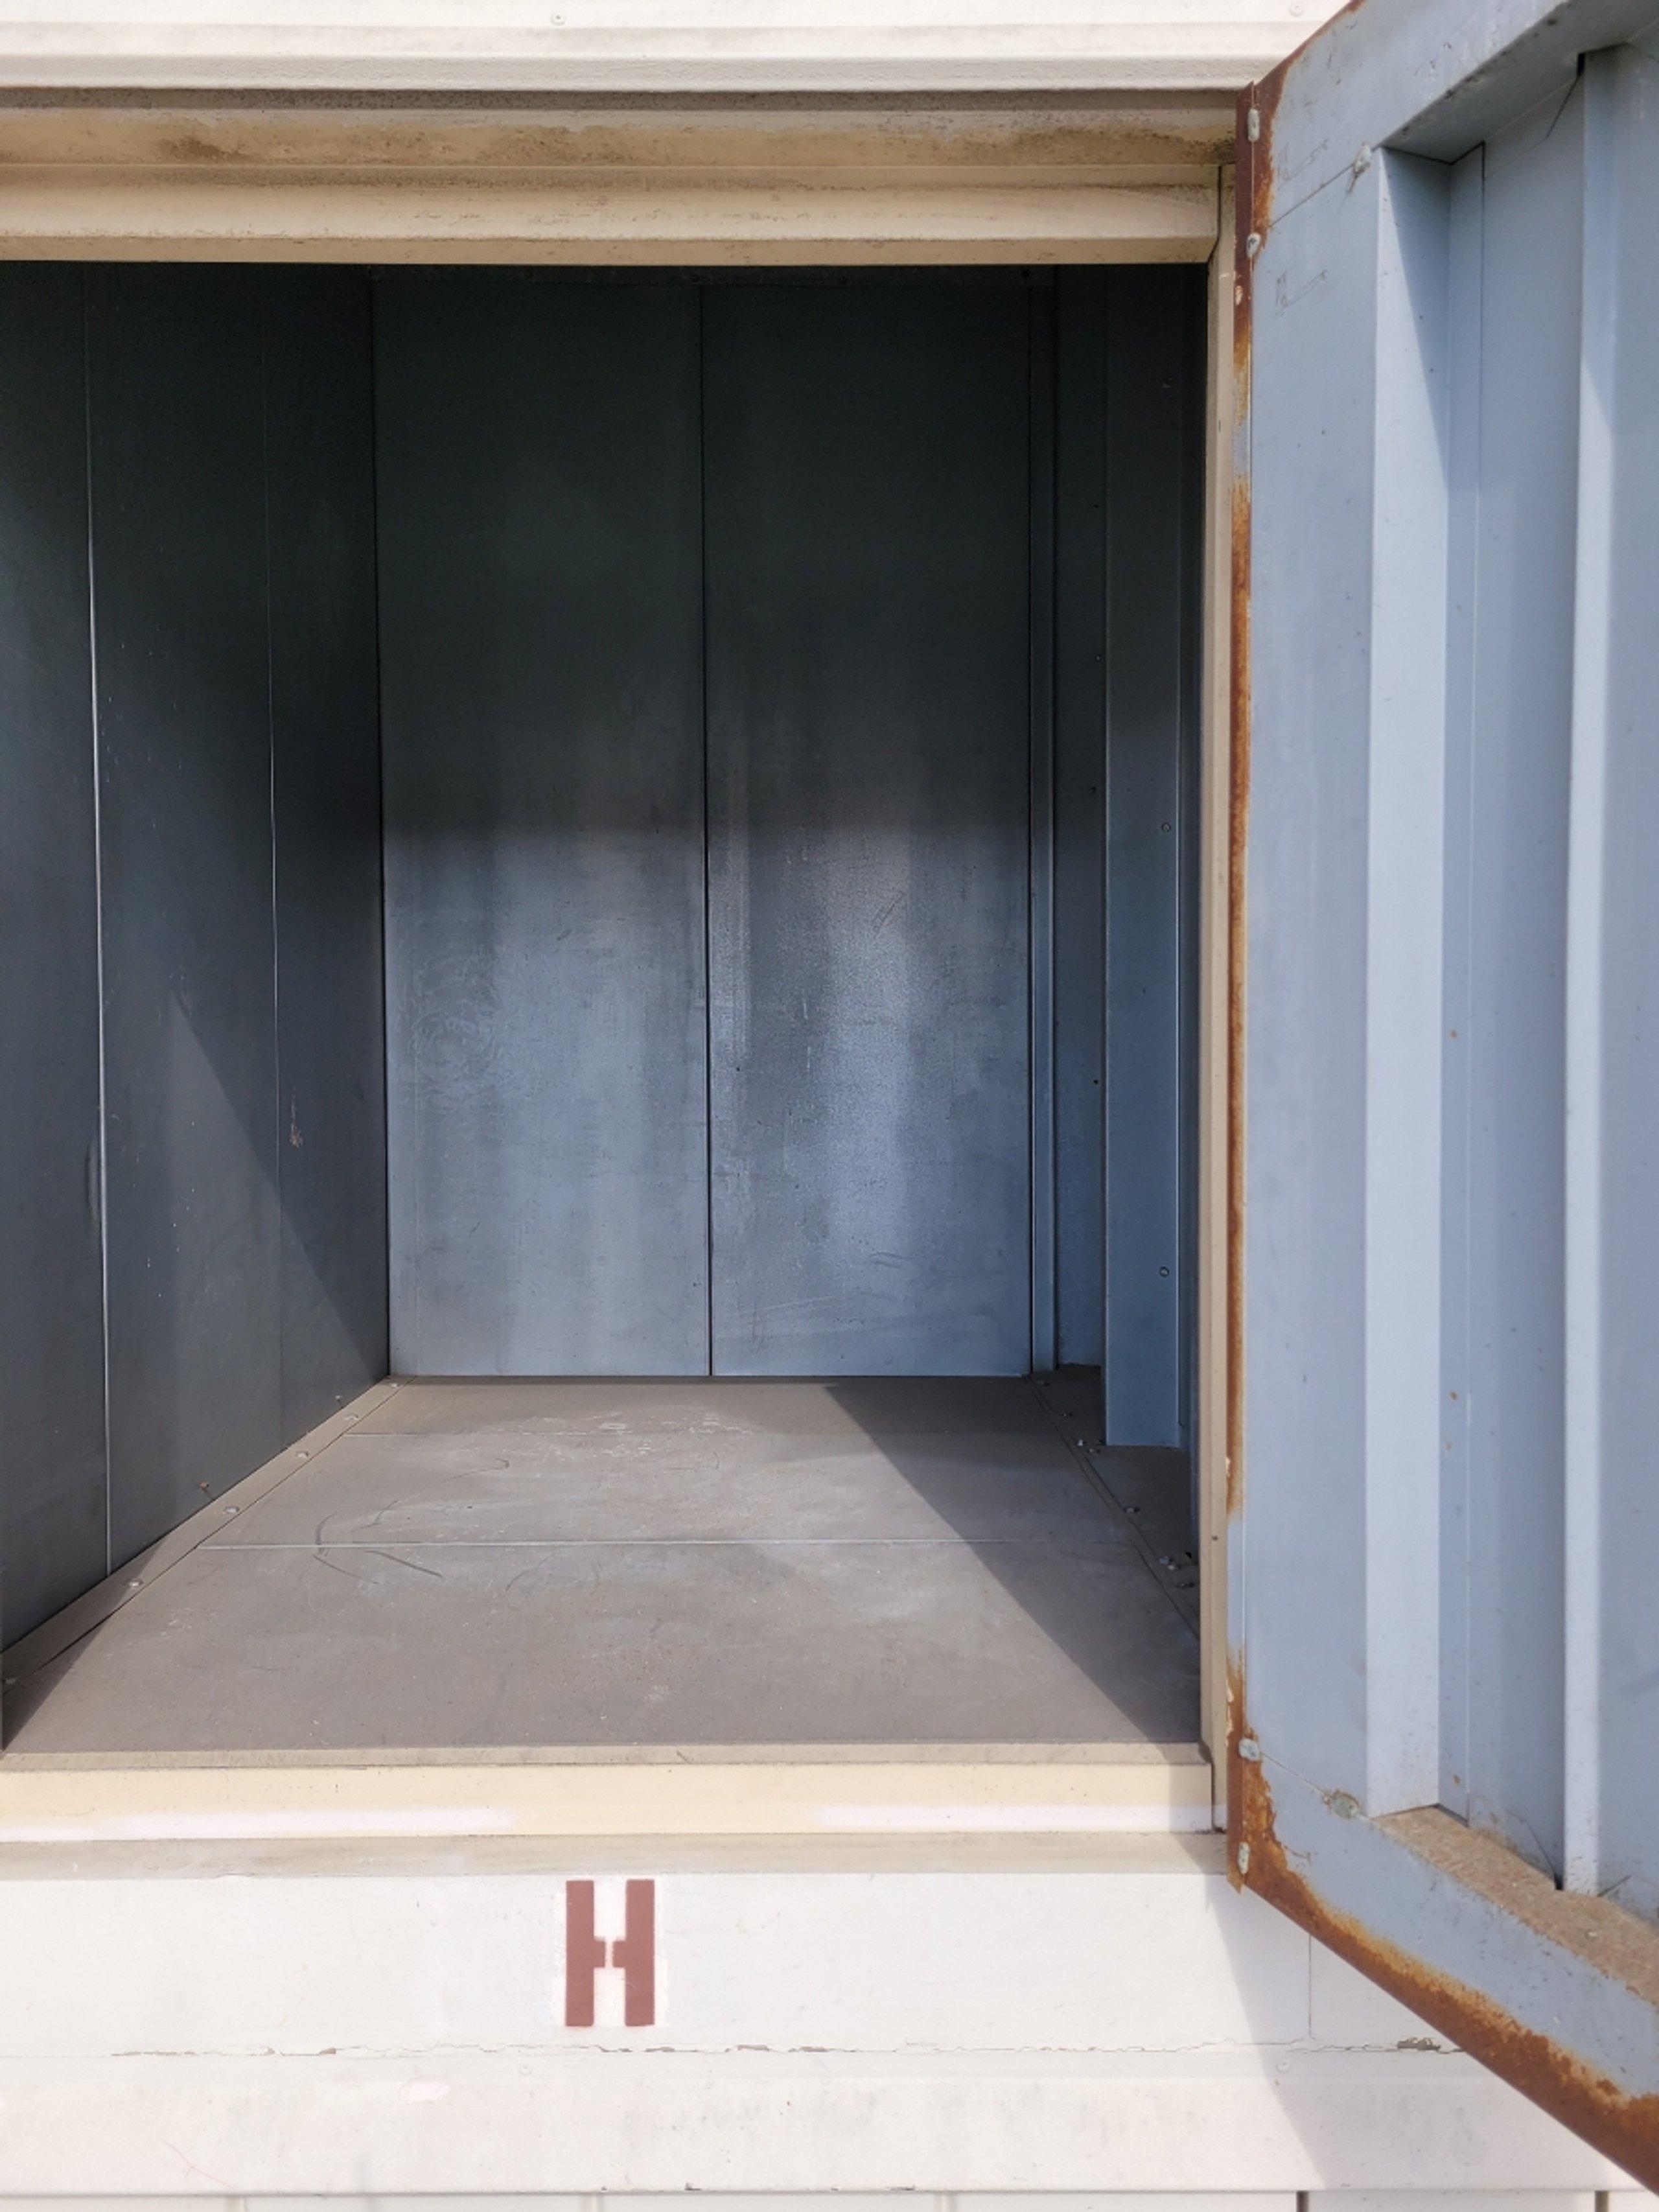 4x4 Self Storage Unit self storage unit